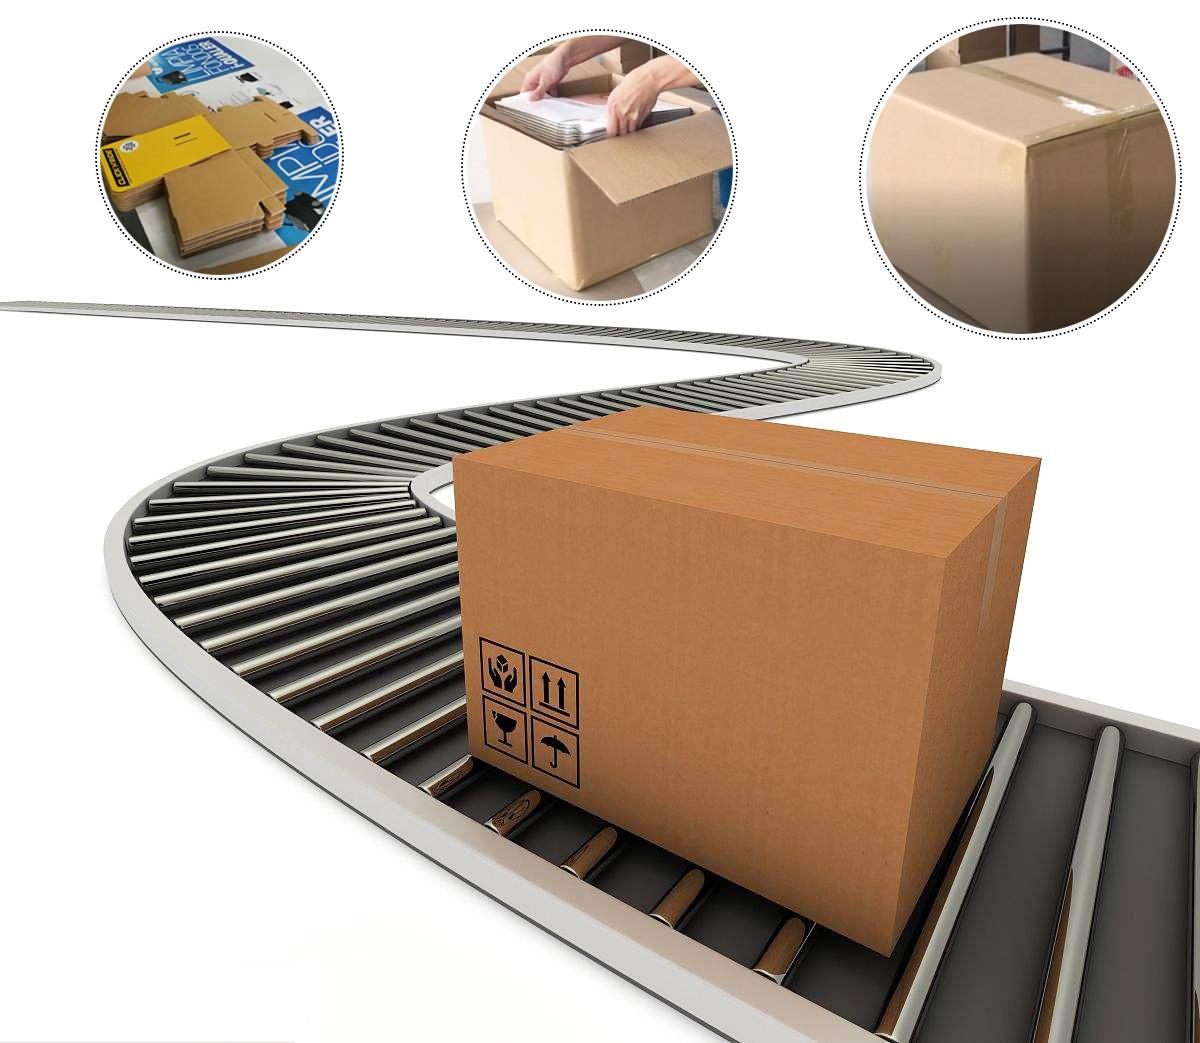 SAFEKA -Retail Advertising Pos Cardboard Display And Counter Top Display-3